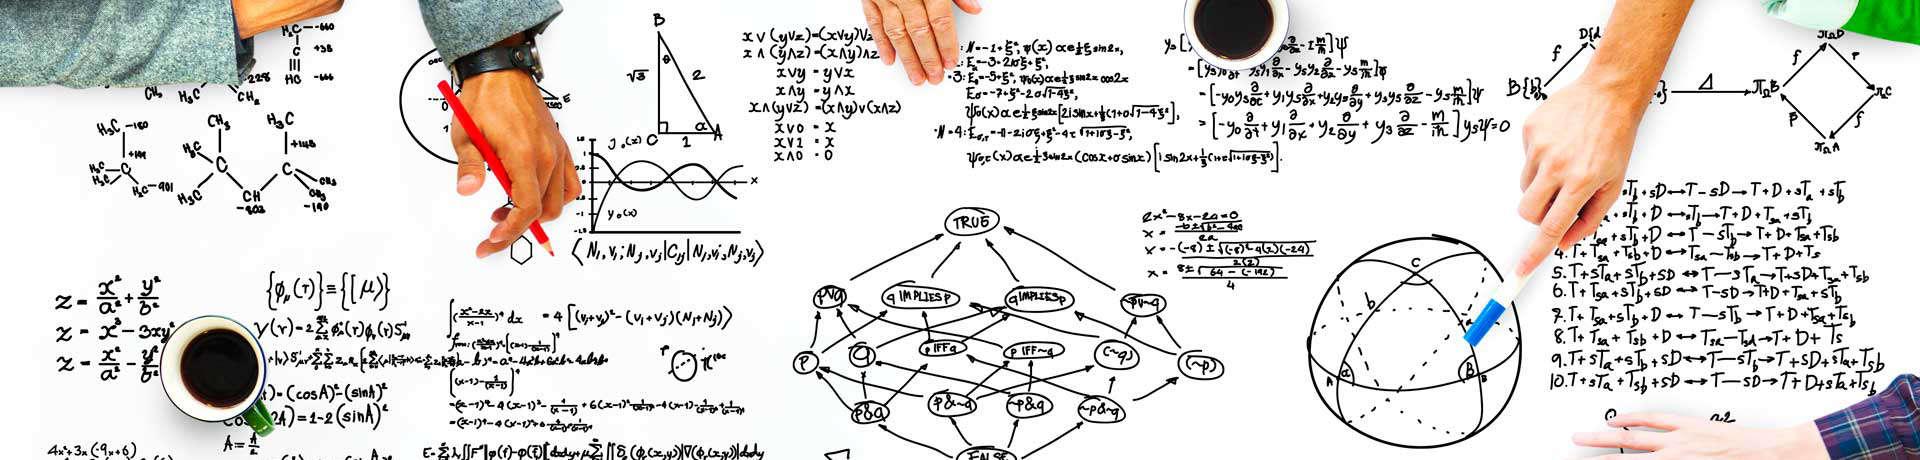 MatDeck - Software for Math and Technical Computing